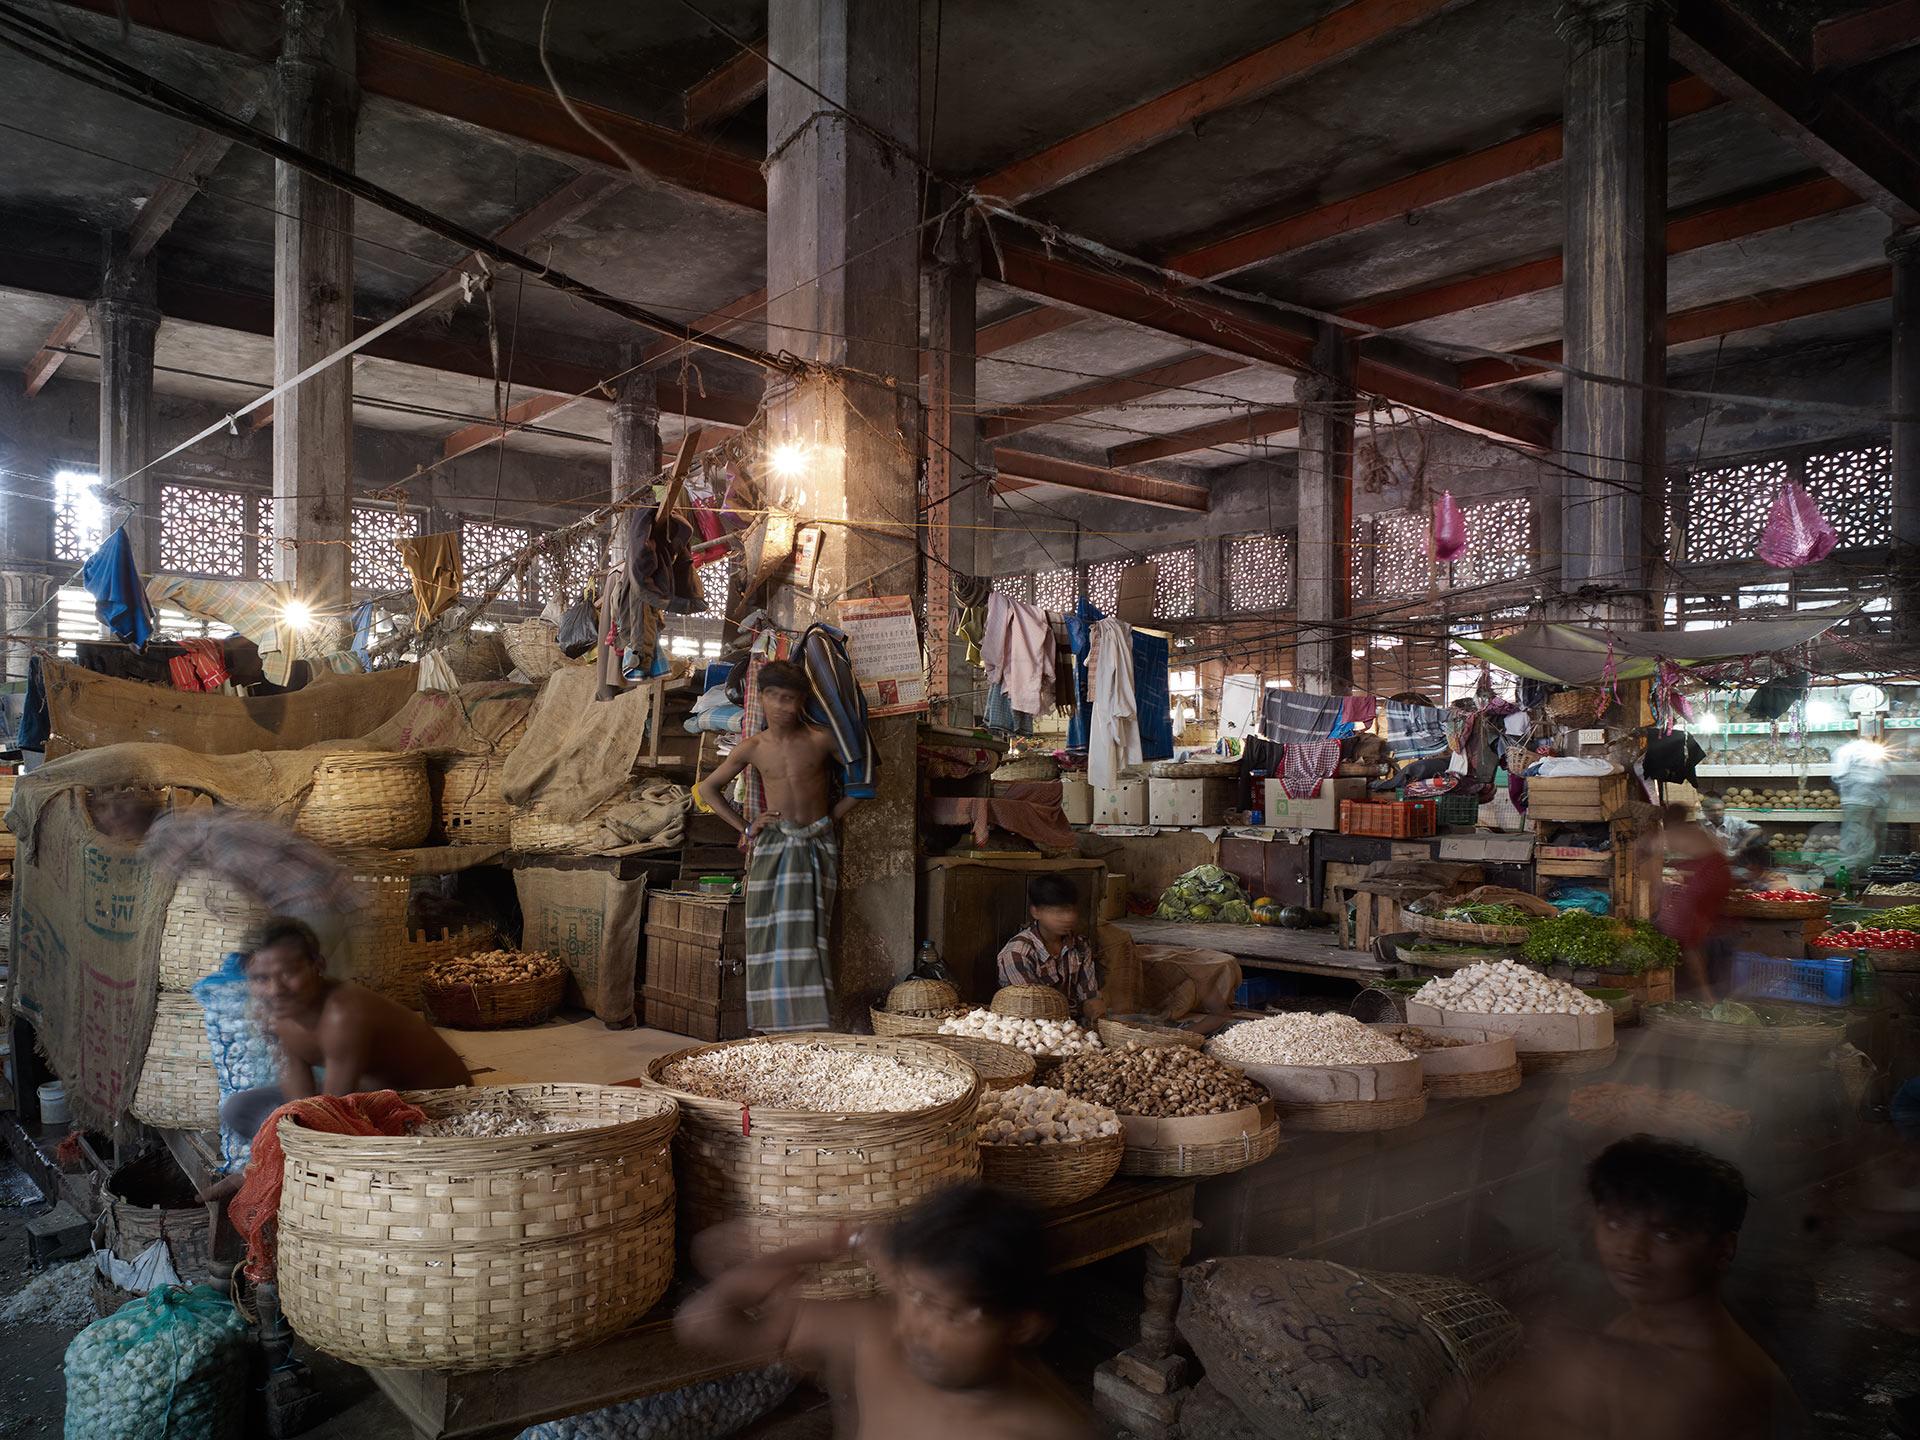 Hogg-Street-Market-#8,-Kolkata,-India---2013.jpg